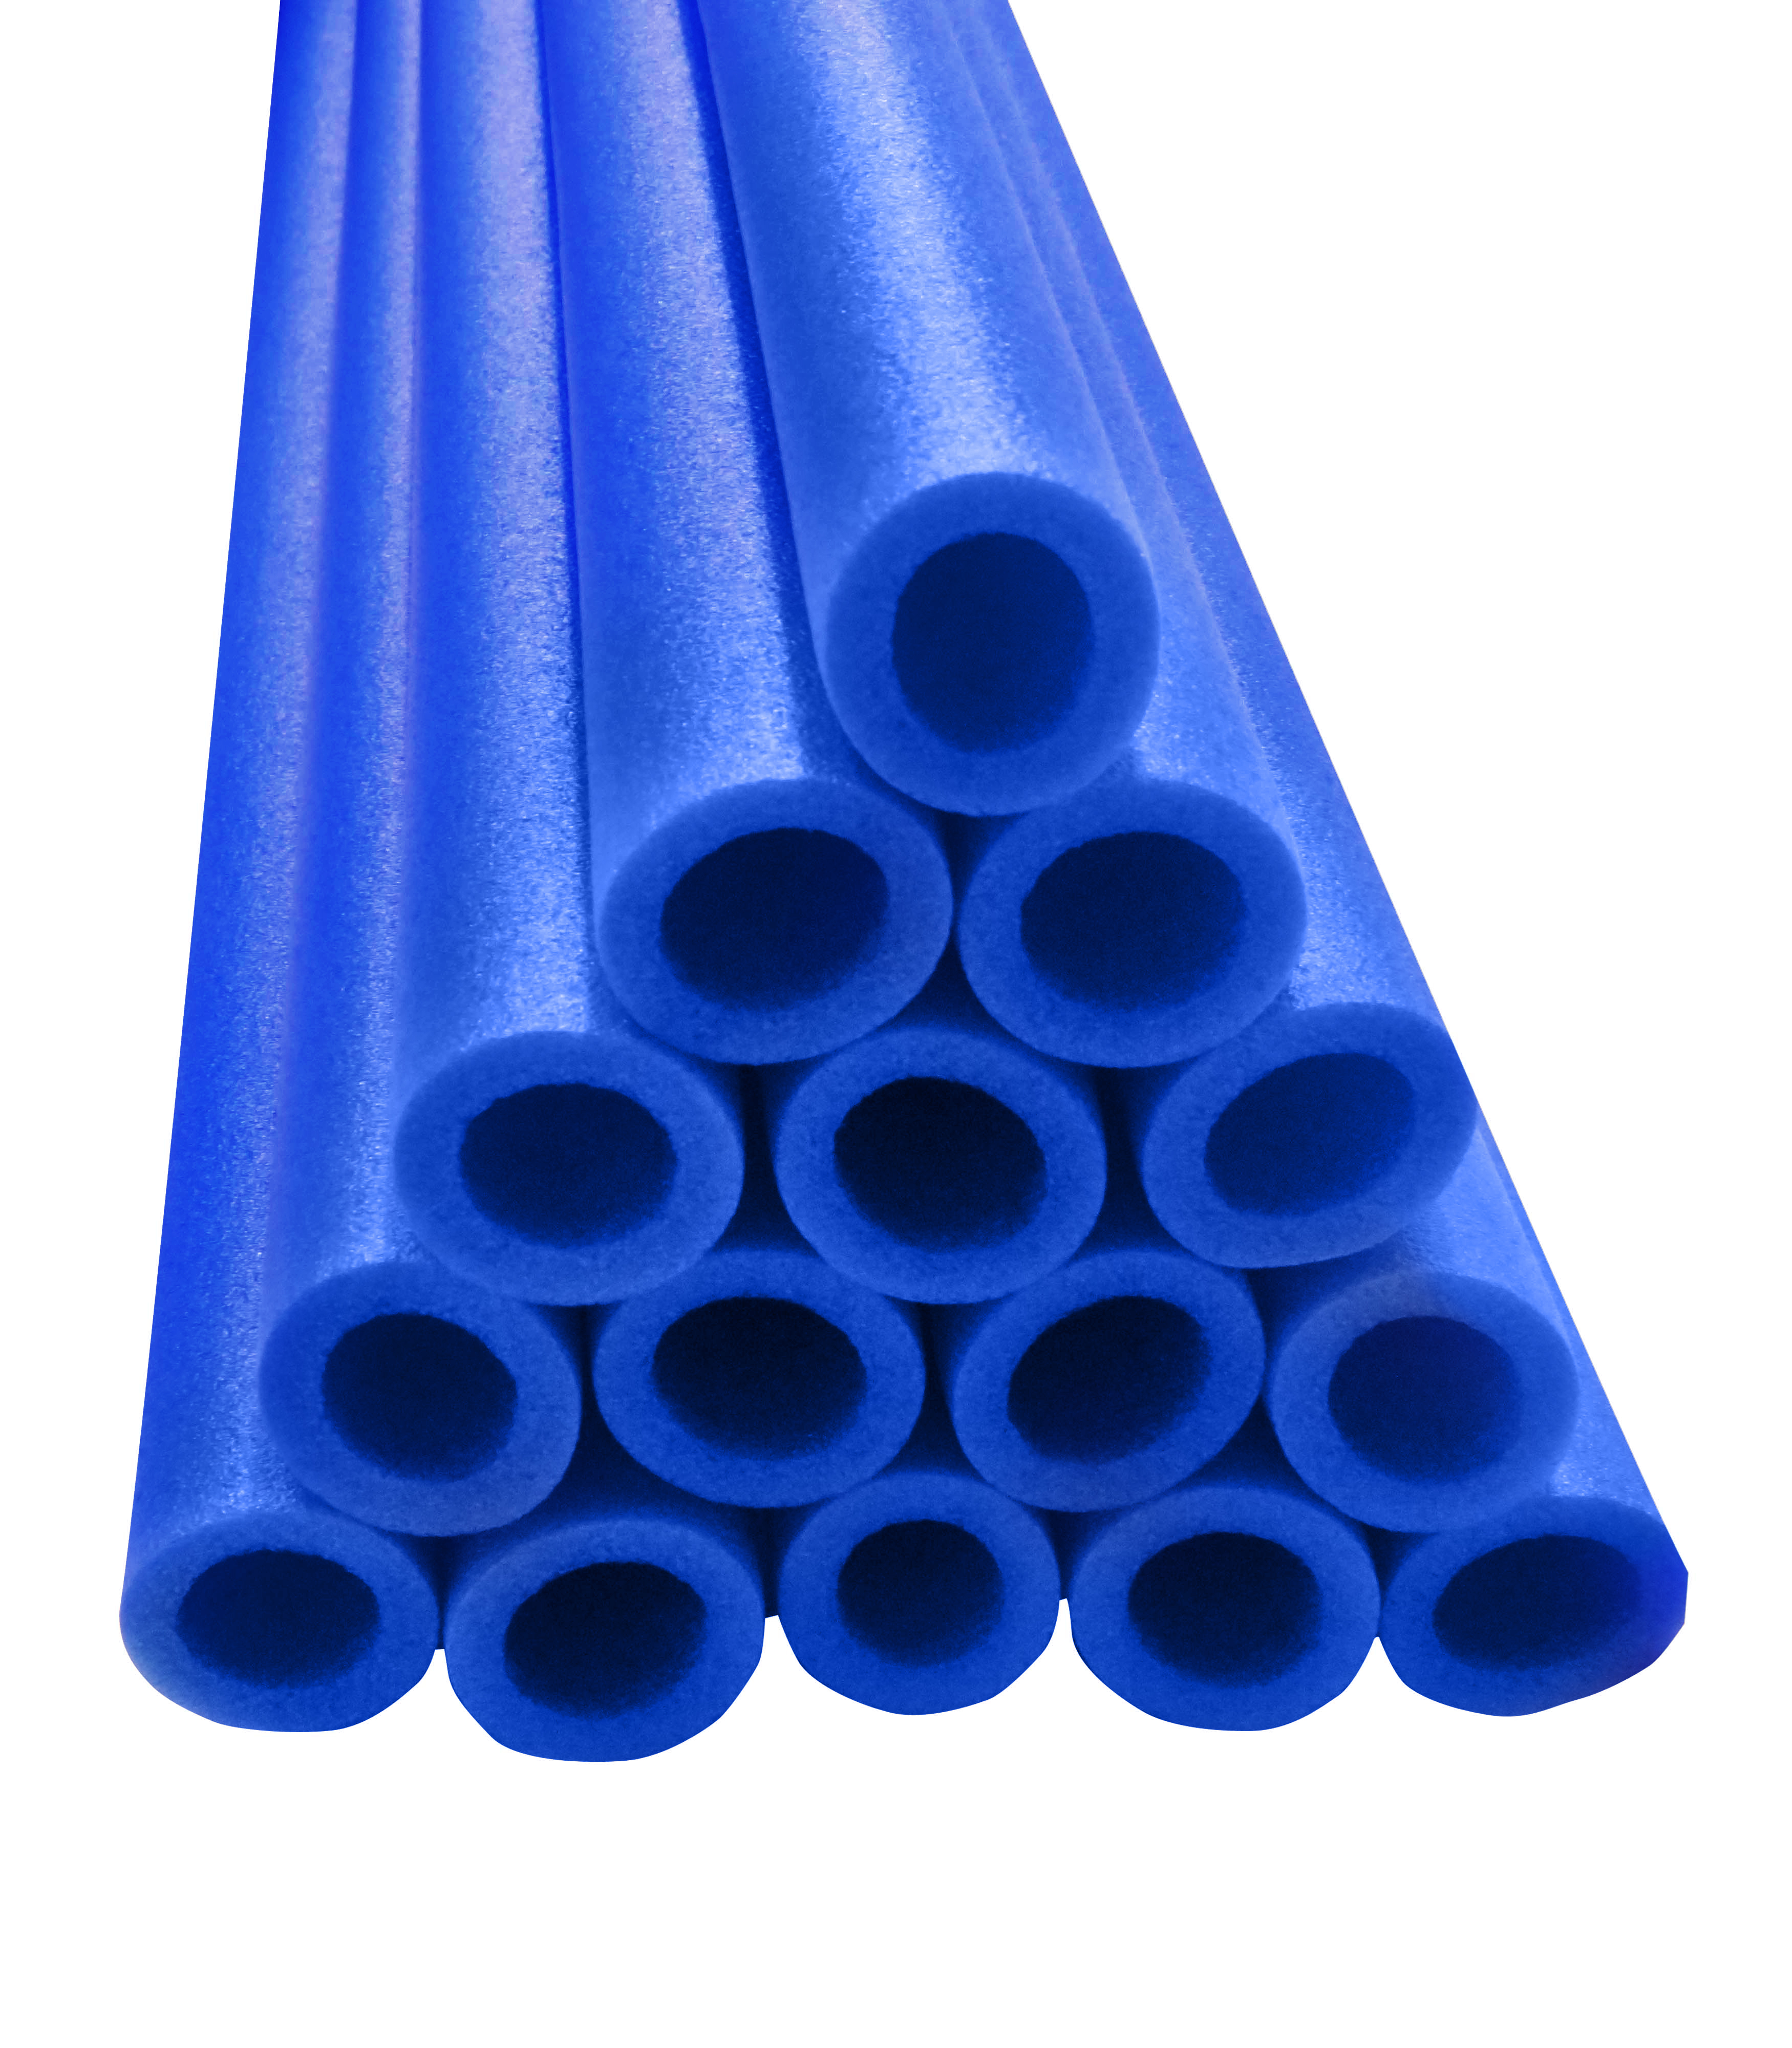 "33 Inch Trampoline Pole Foam sleeves, fits for 1"" Diameter Pole Set of 16 -Blue"